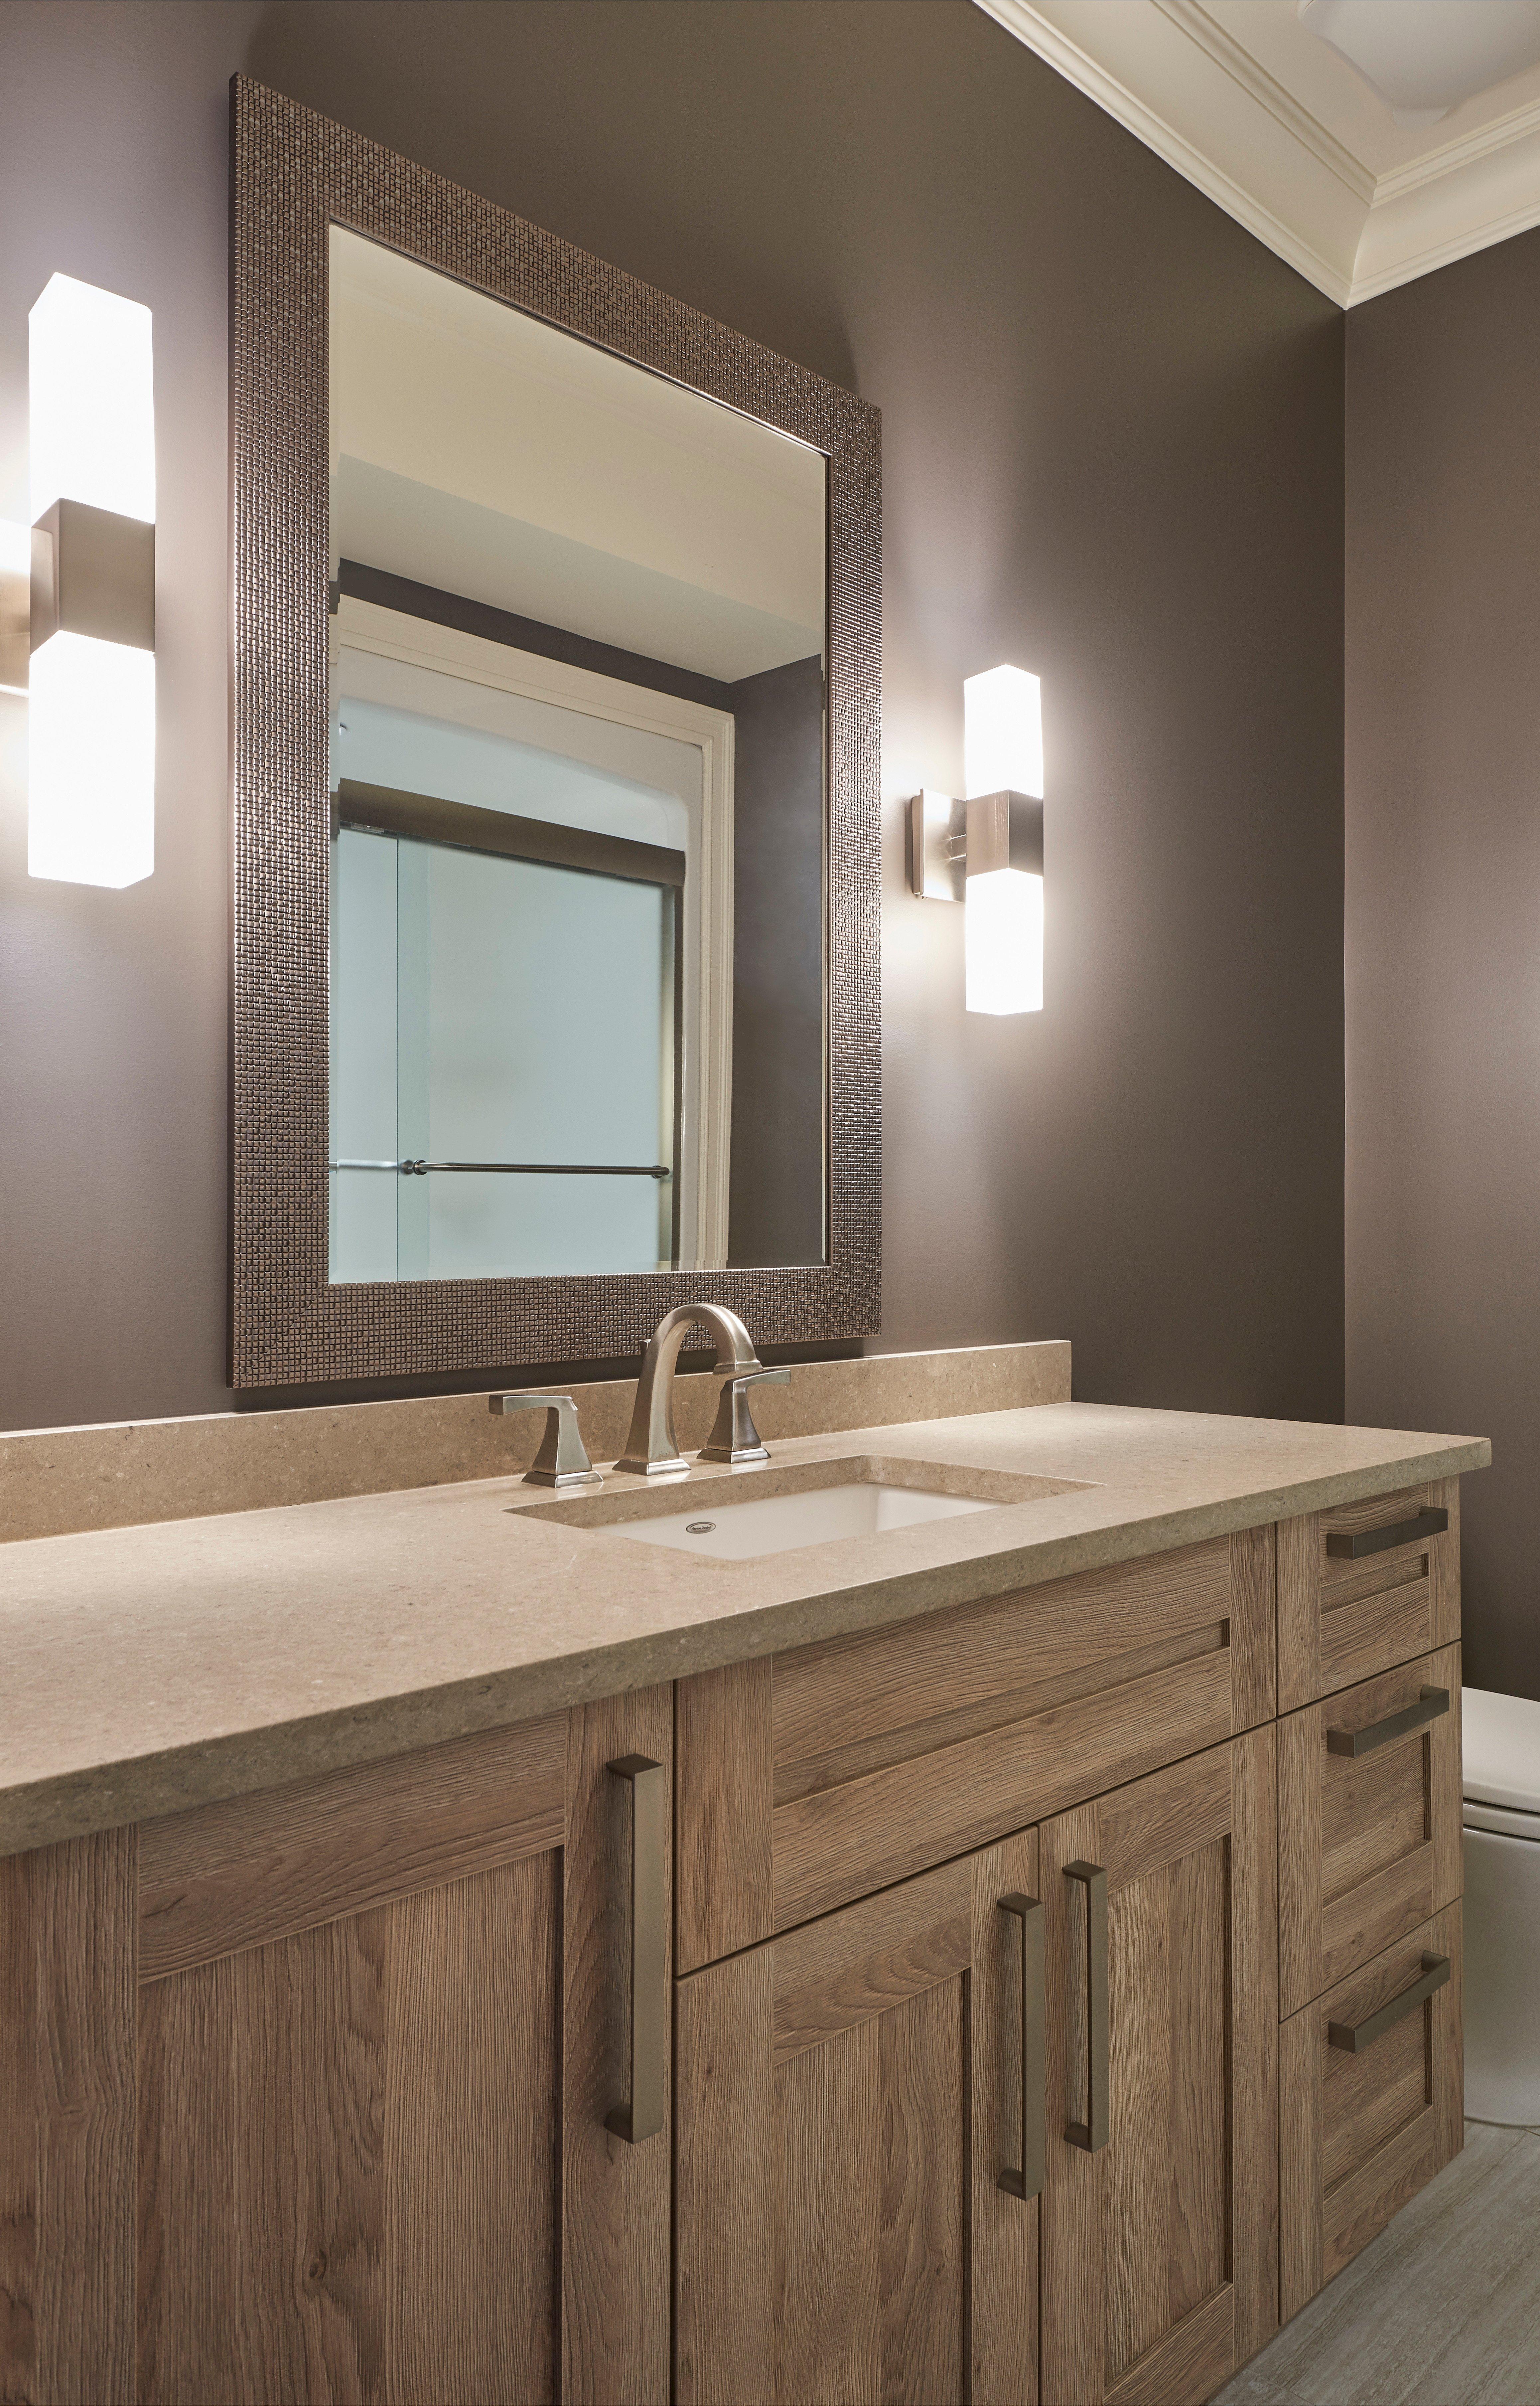 Using Ikea Kitchen Cabinets In Bathroom